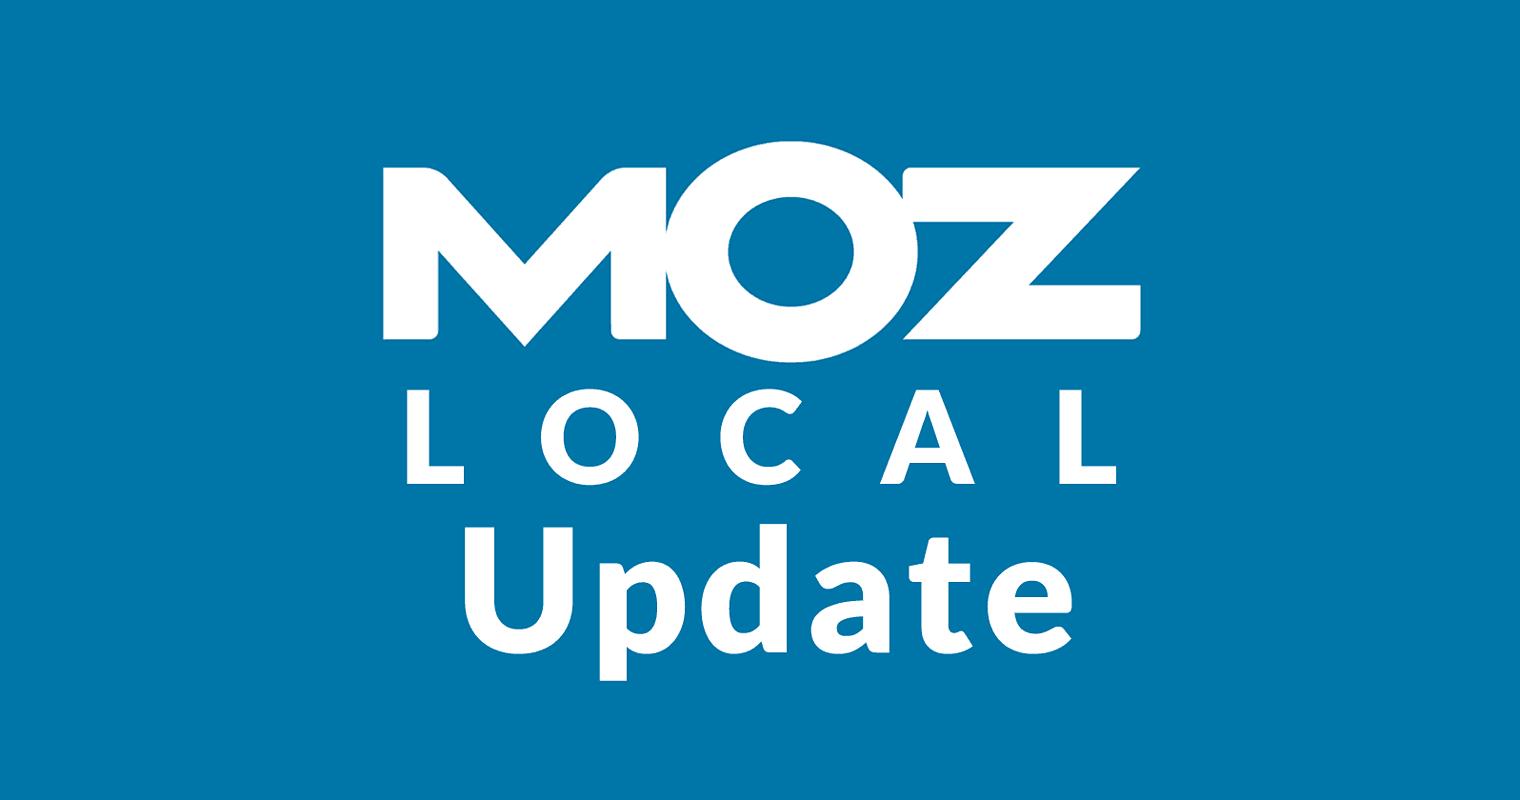 Major Update to Moz Local in June 2019